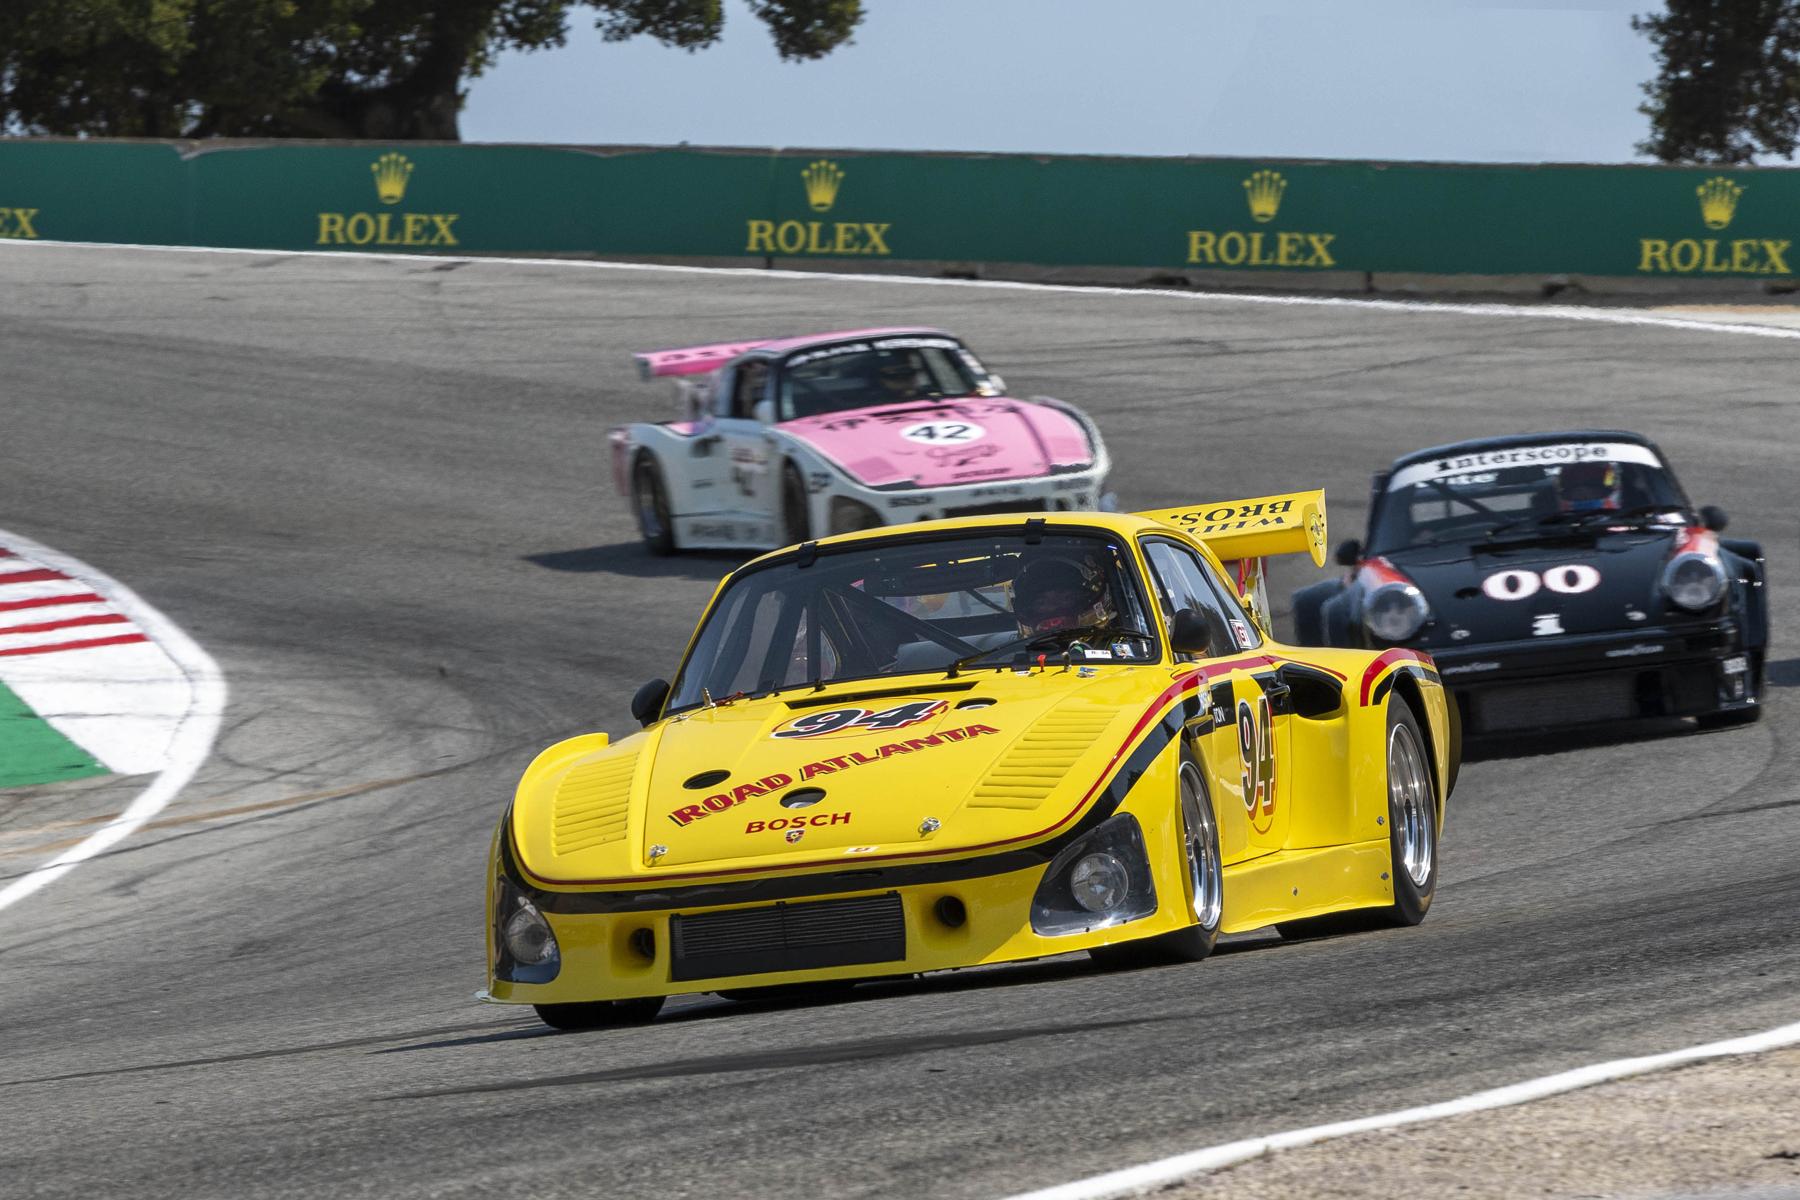 Group 3A: 1973-1981 FIA, IMSA, GT, GTX, GTU, AAGT - Carlos de Quesada - 1979 Porsche 935K3 - ©Rex McAfee